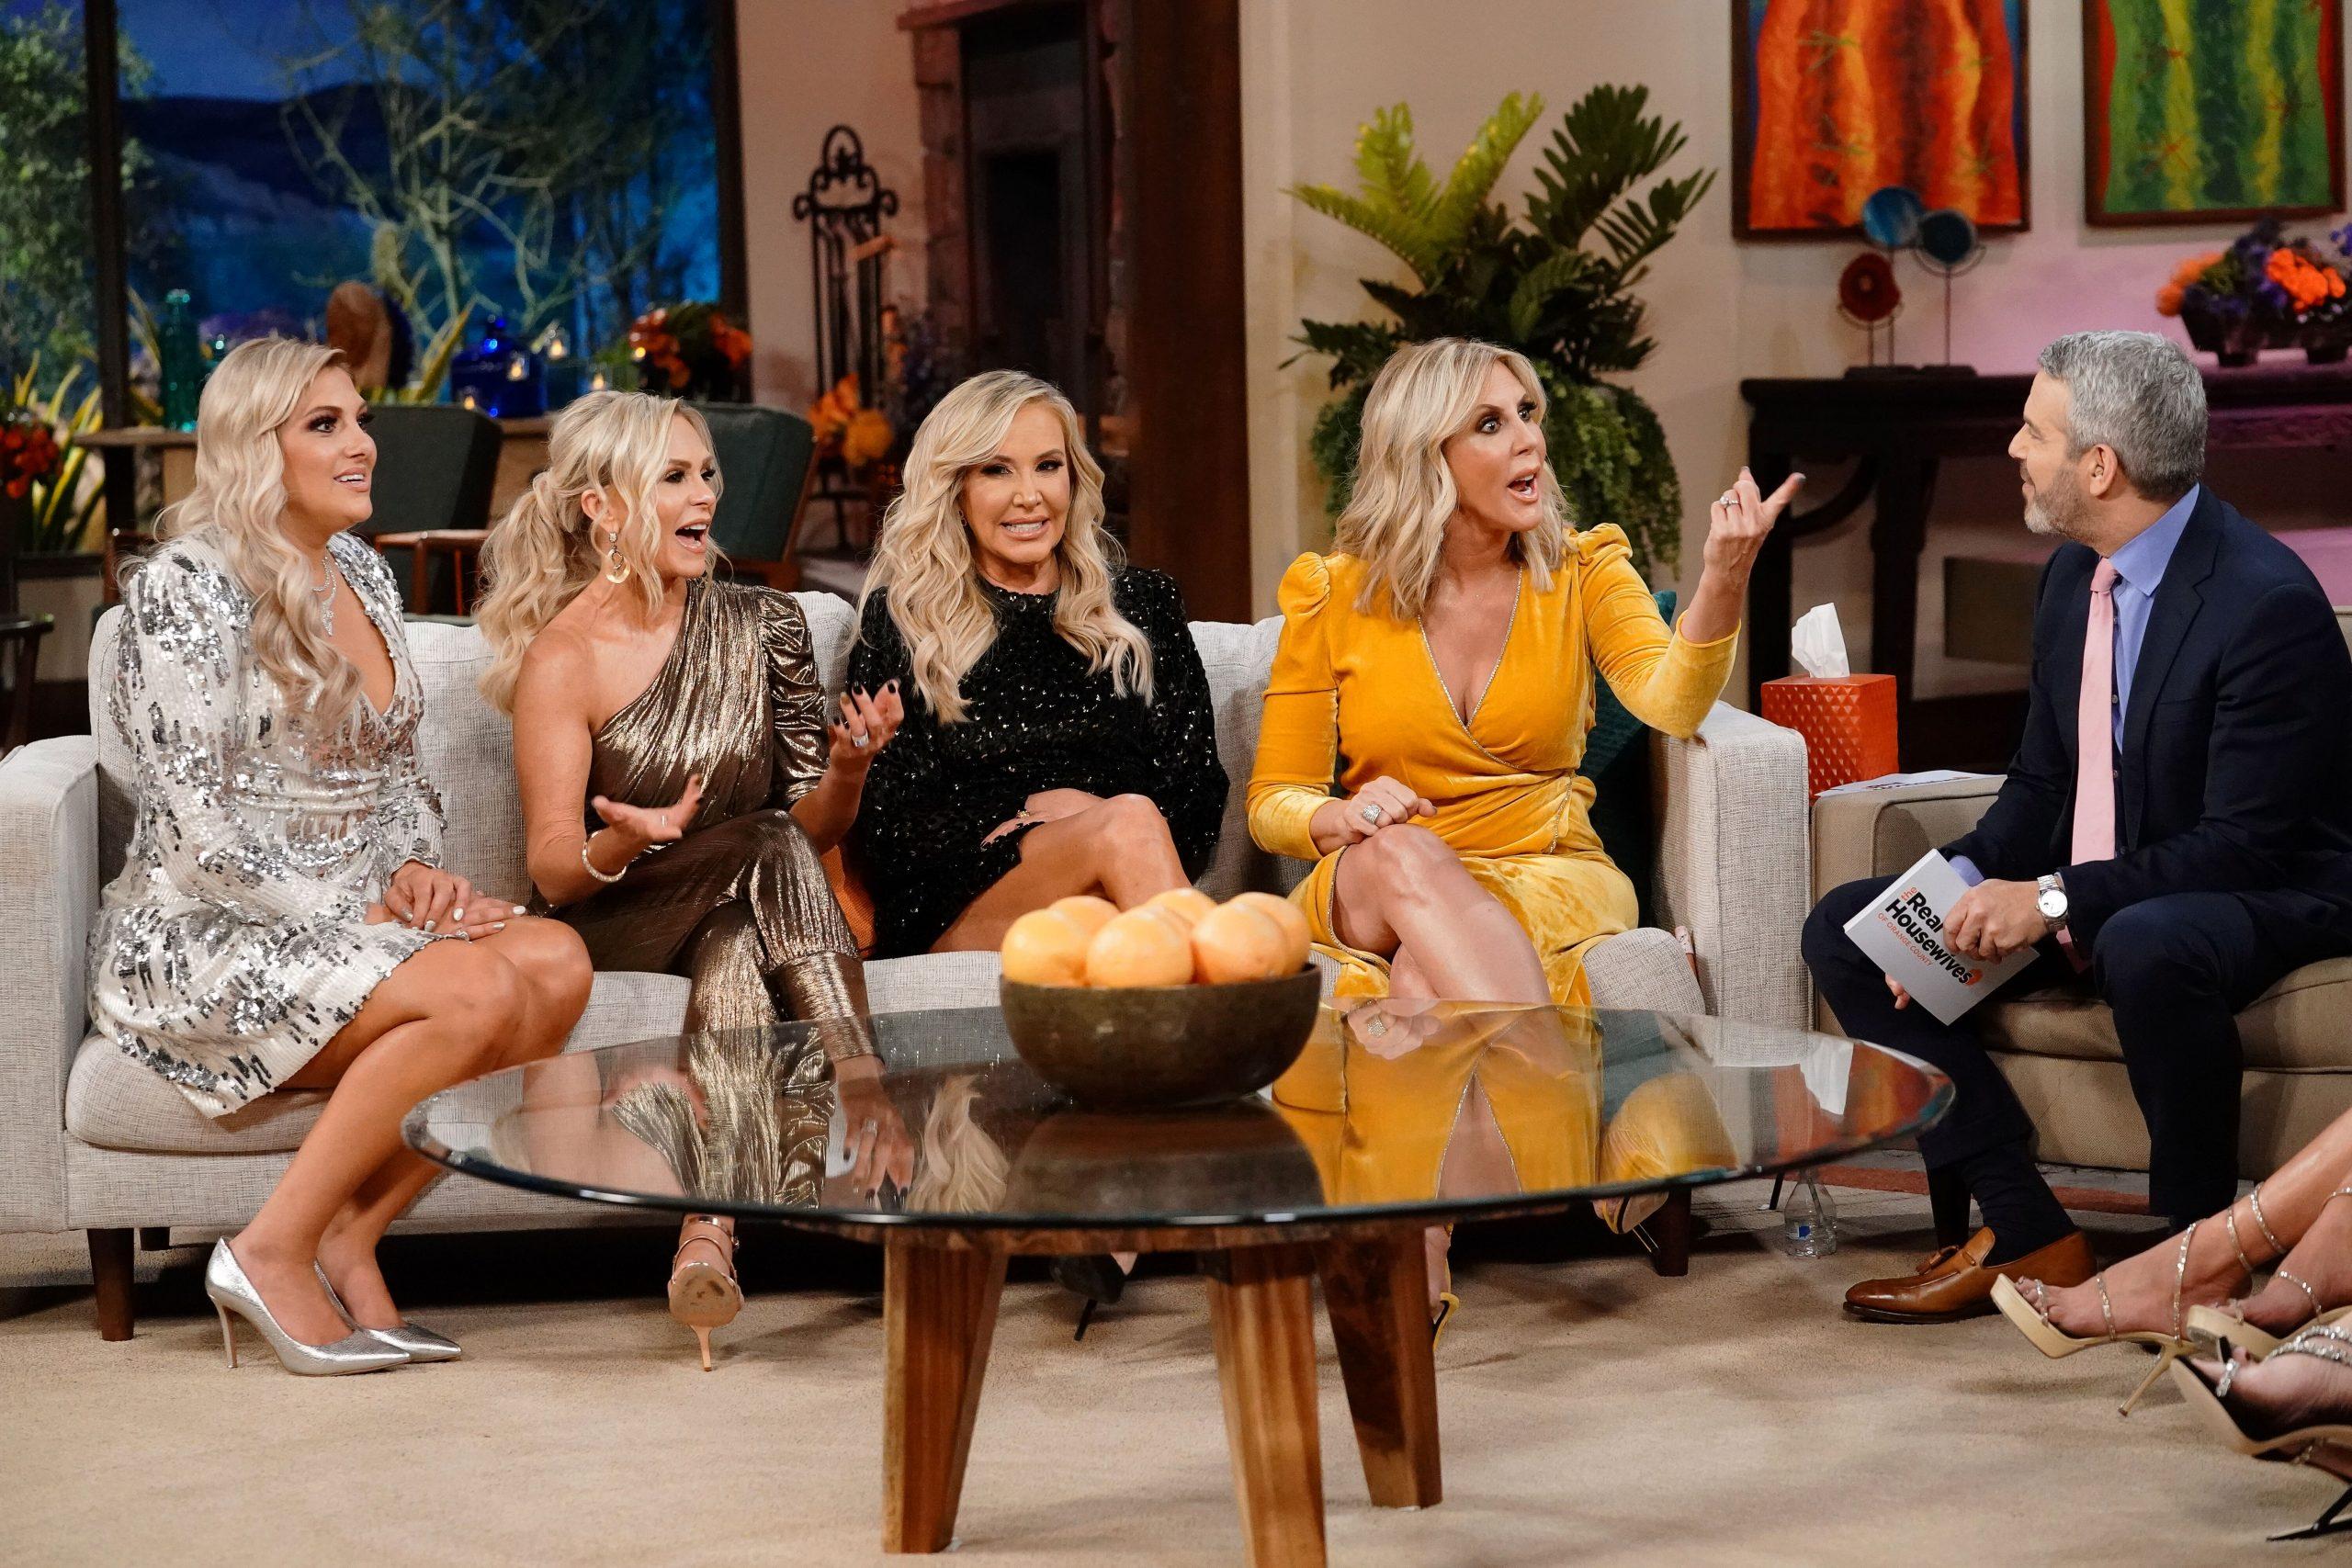 RHOC, RHOC reunion, The Real Housewives of Orange County, Bravo